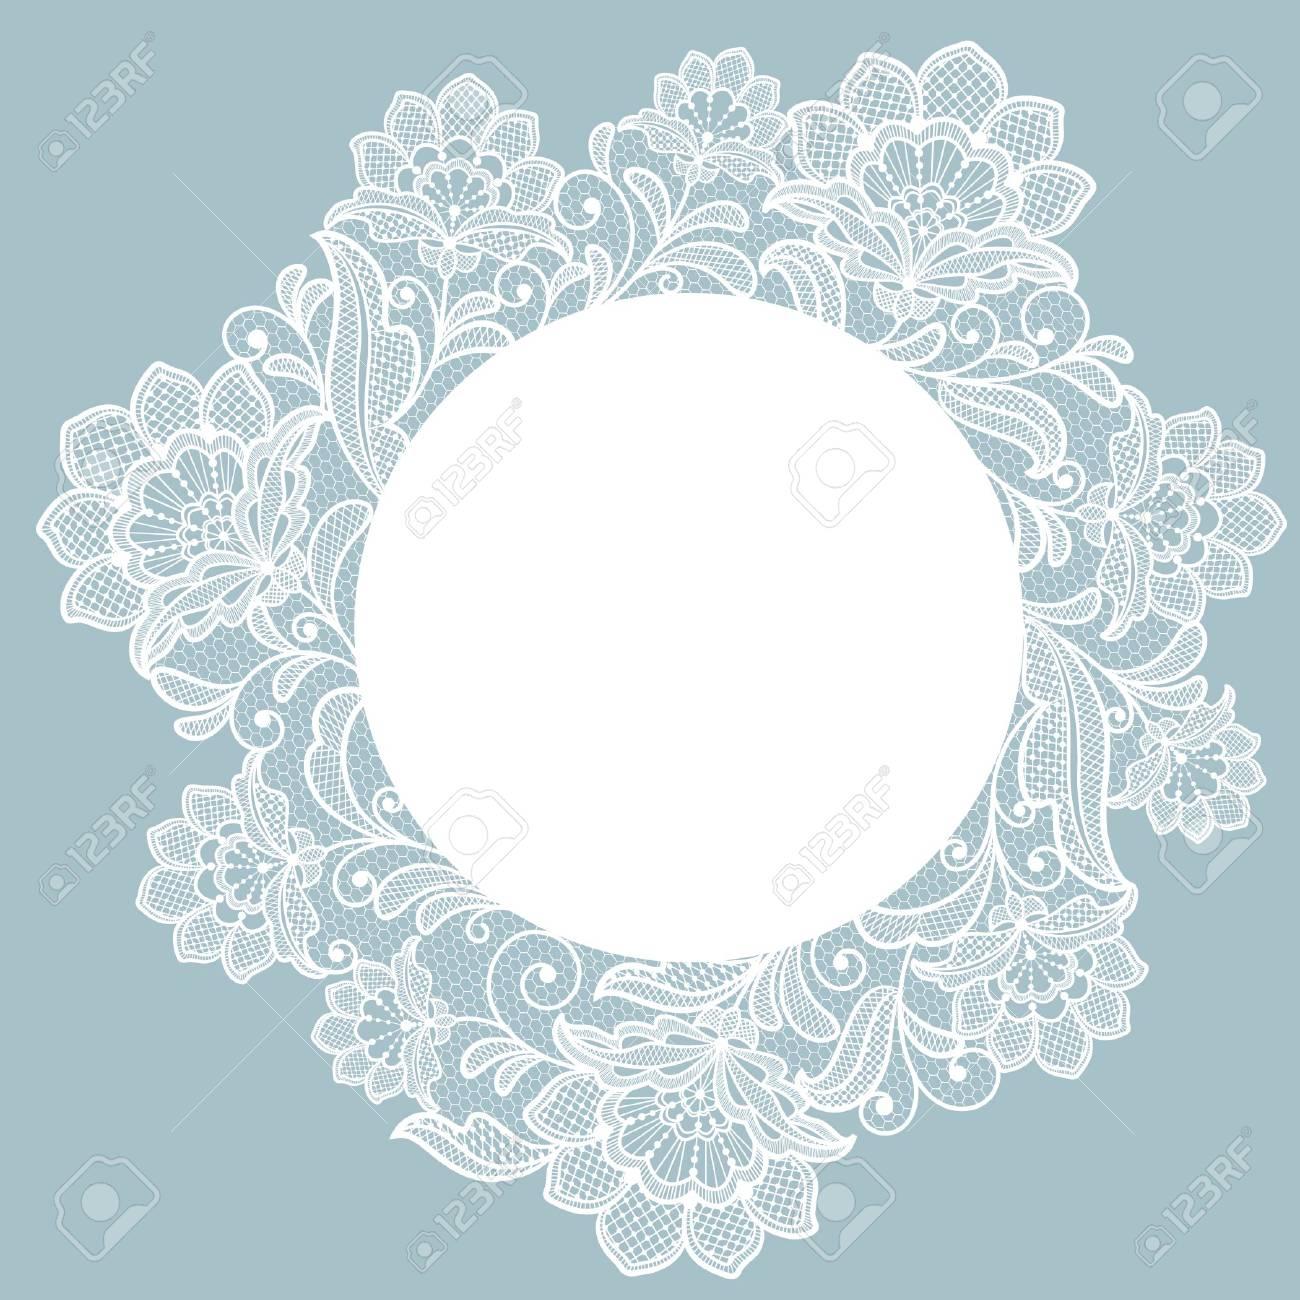 Template frame design for card. Lace floral frame. - 117097161